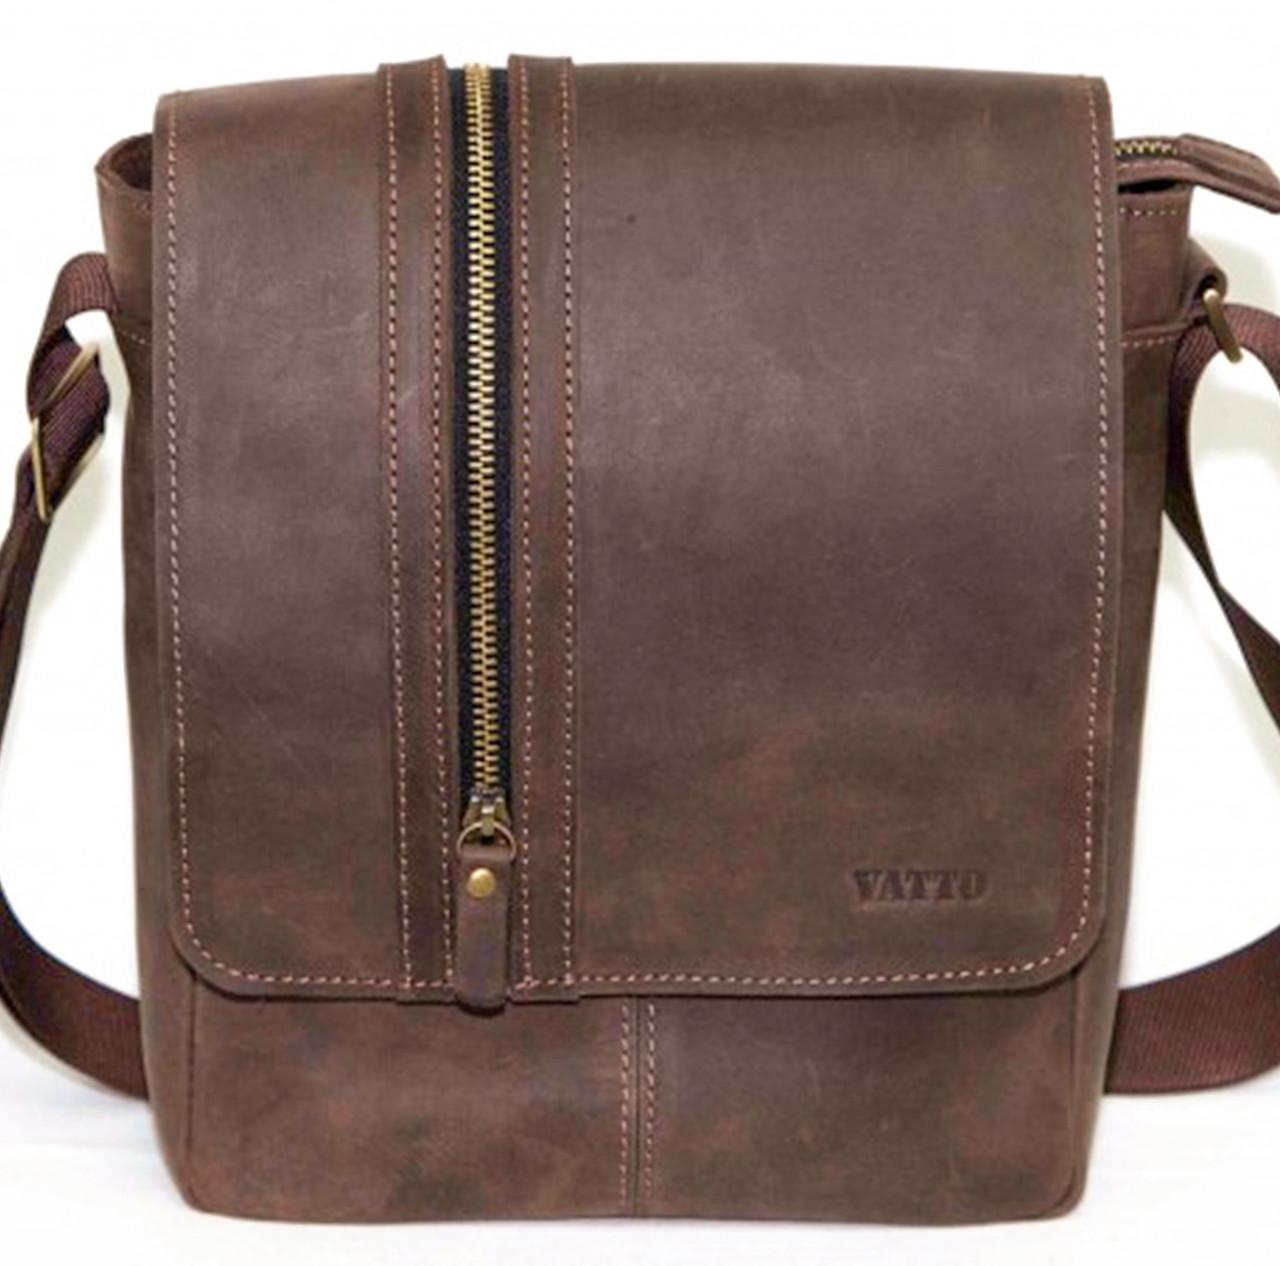 Мужская сумка натуральная кожа коричневая